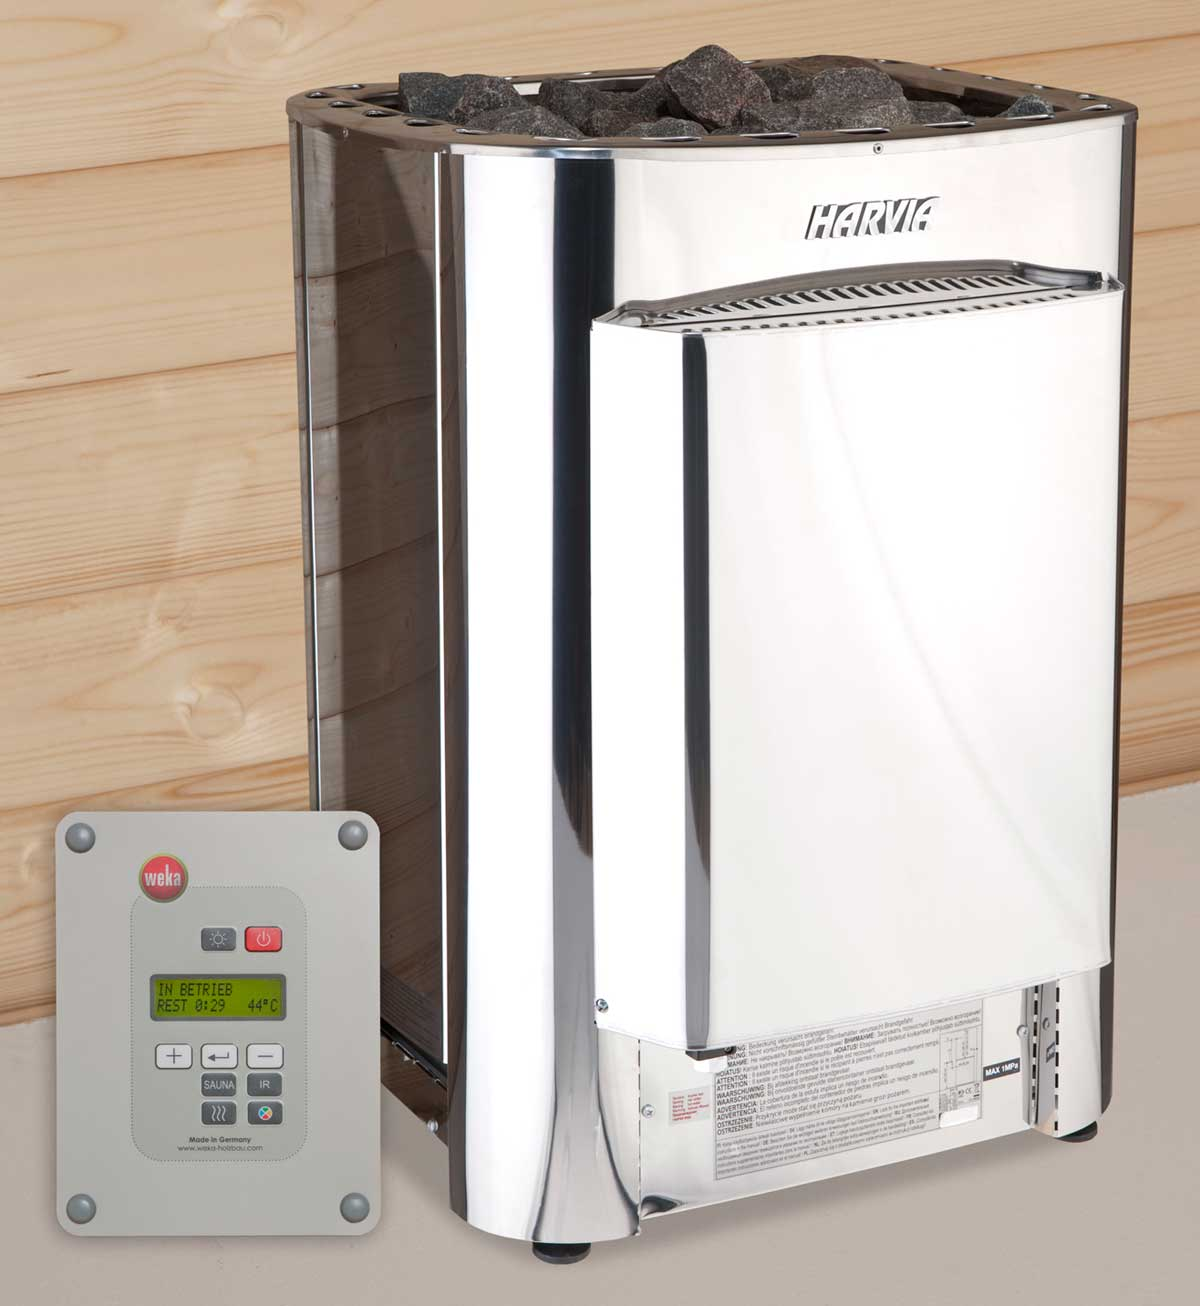 Weka Saunaofen Profi BioS 11 kW mit digitaler Steuerung Bild 1